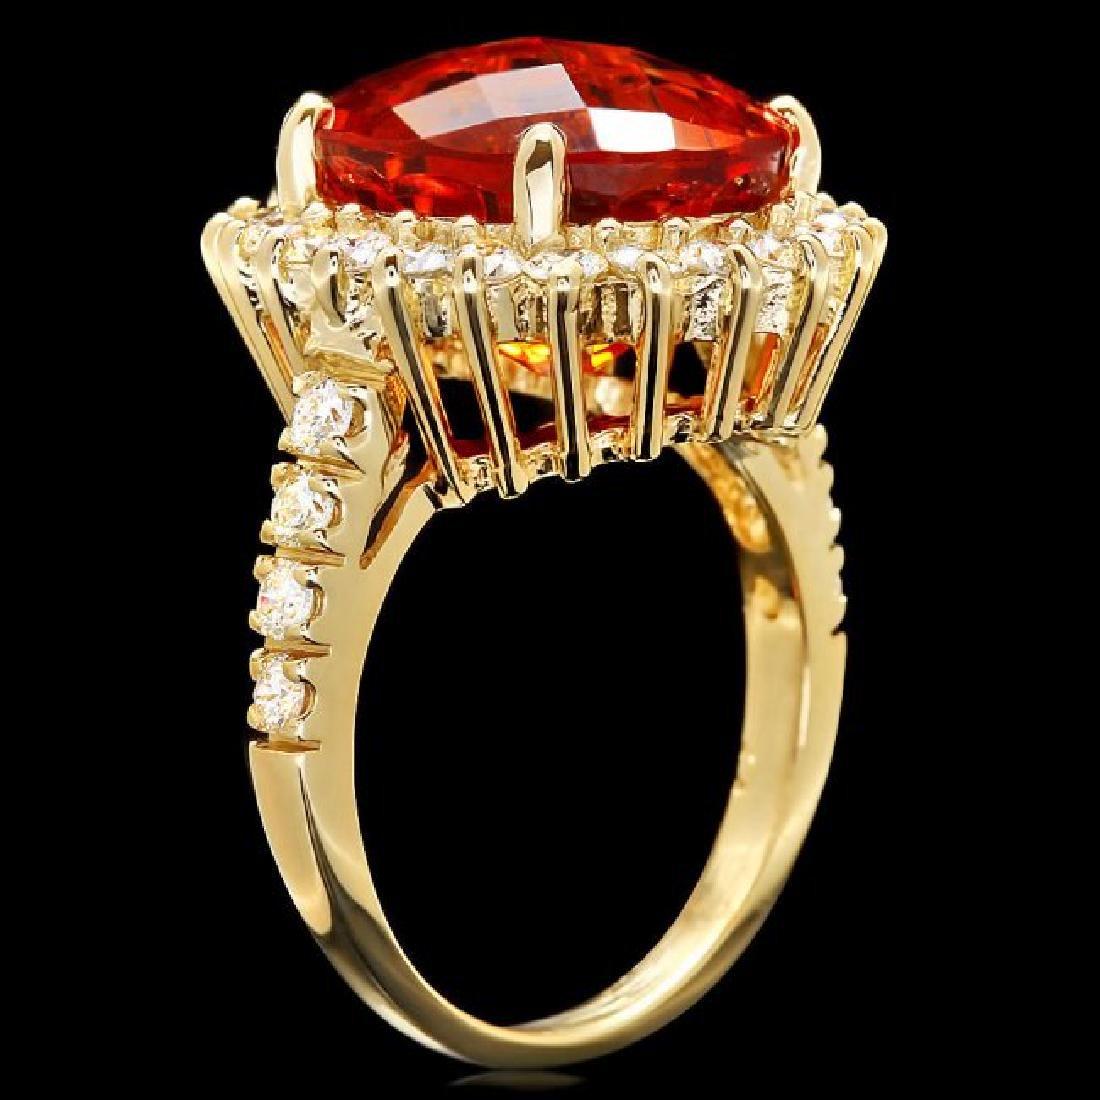 14k Gold 8.00ct Citrine 1.20ct Diamond Ring - 3